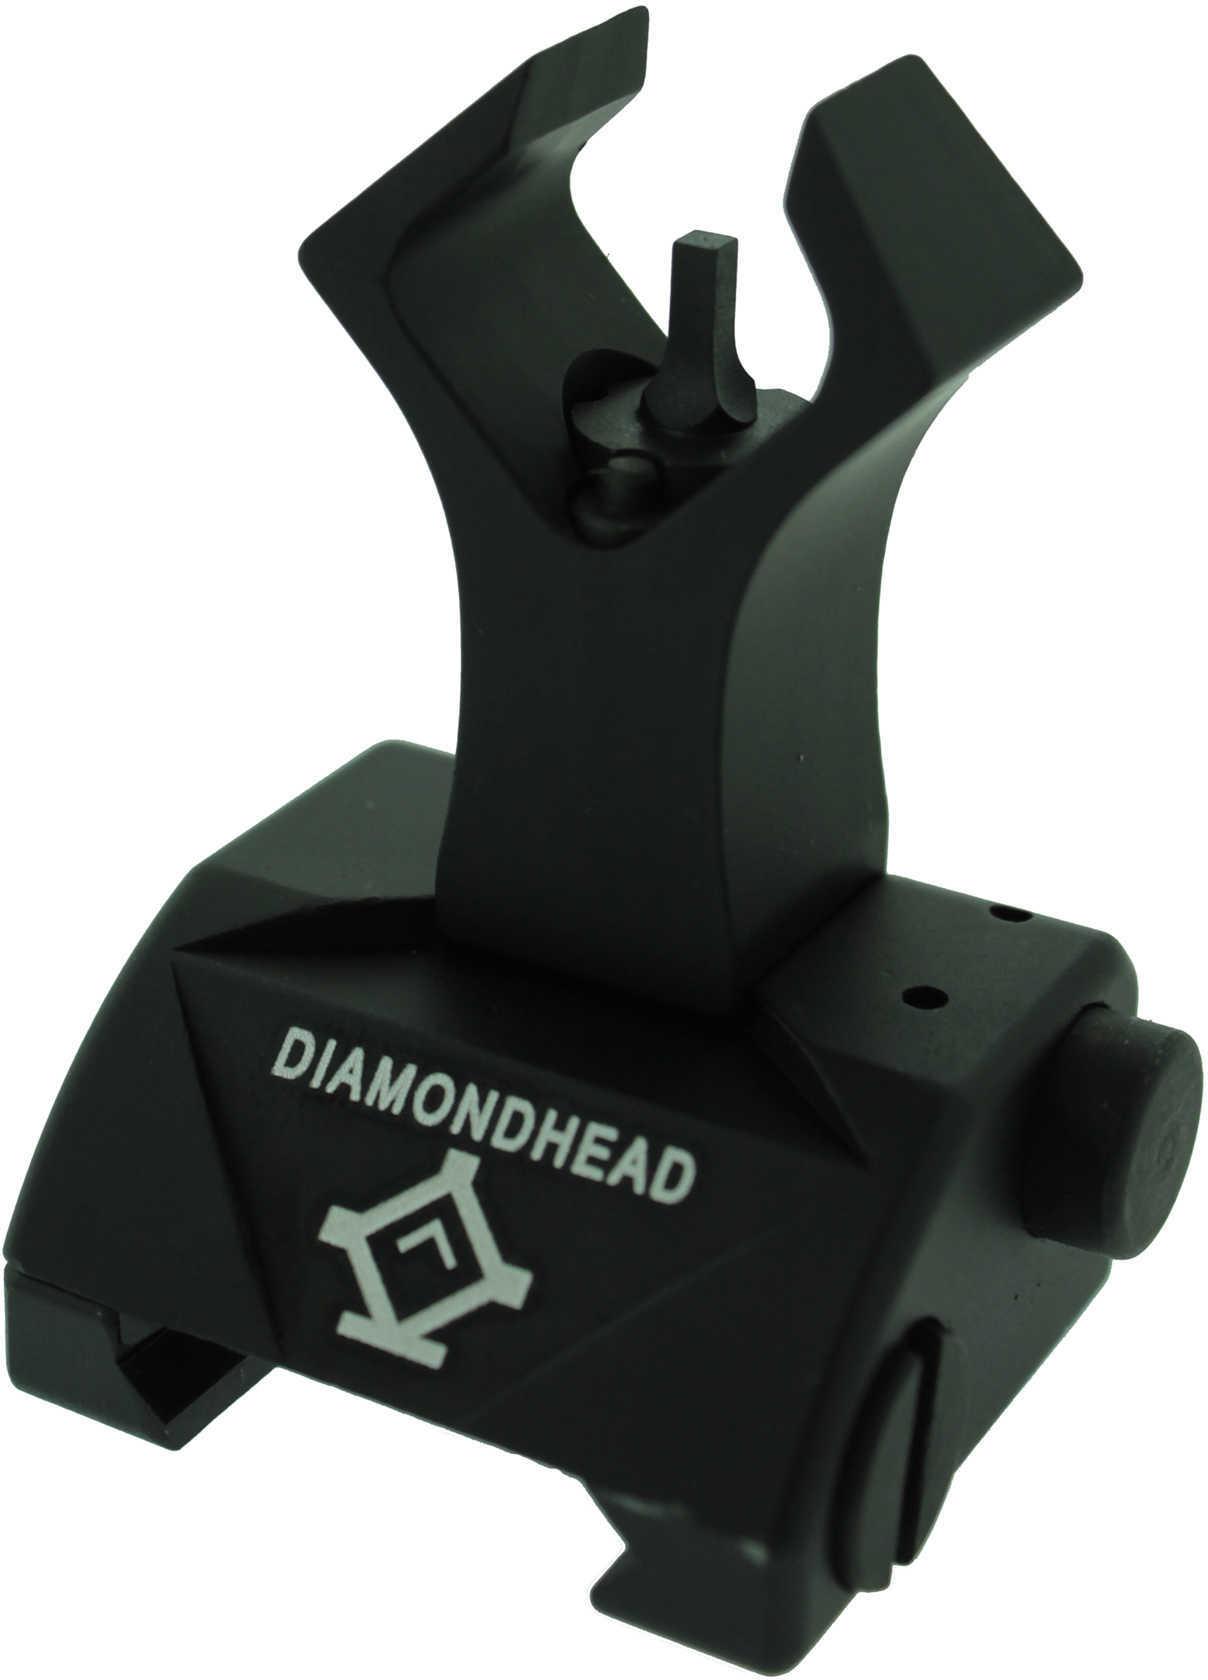 AR-15 Diamondhead USA, Inc. Diamond Sight Sight Picatinny Black Diamond Sight/Post 1051